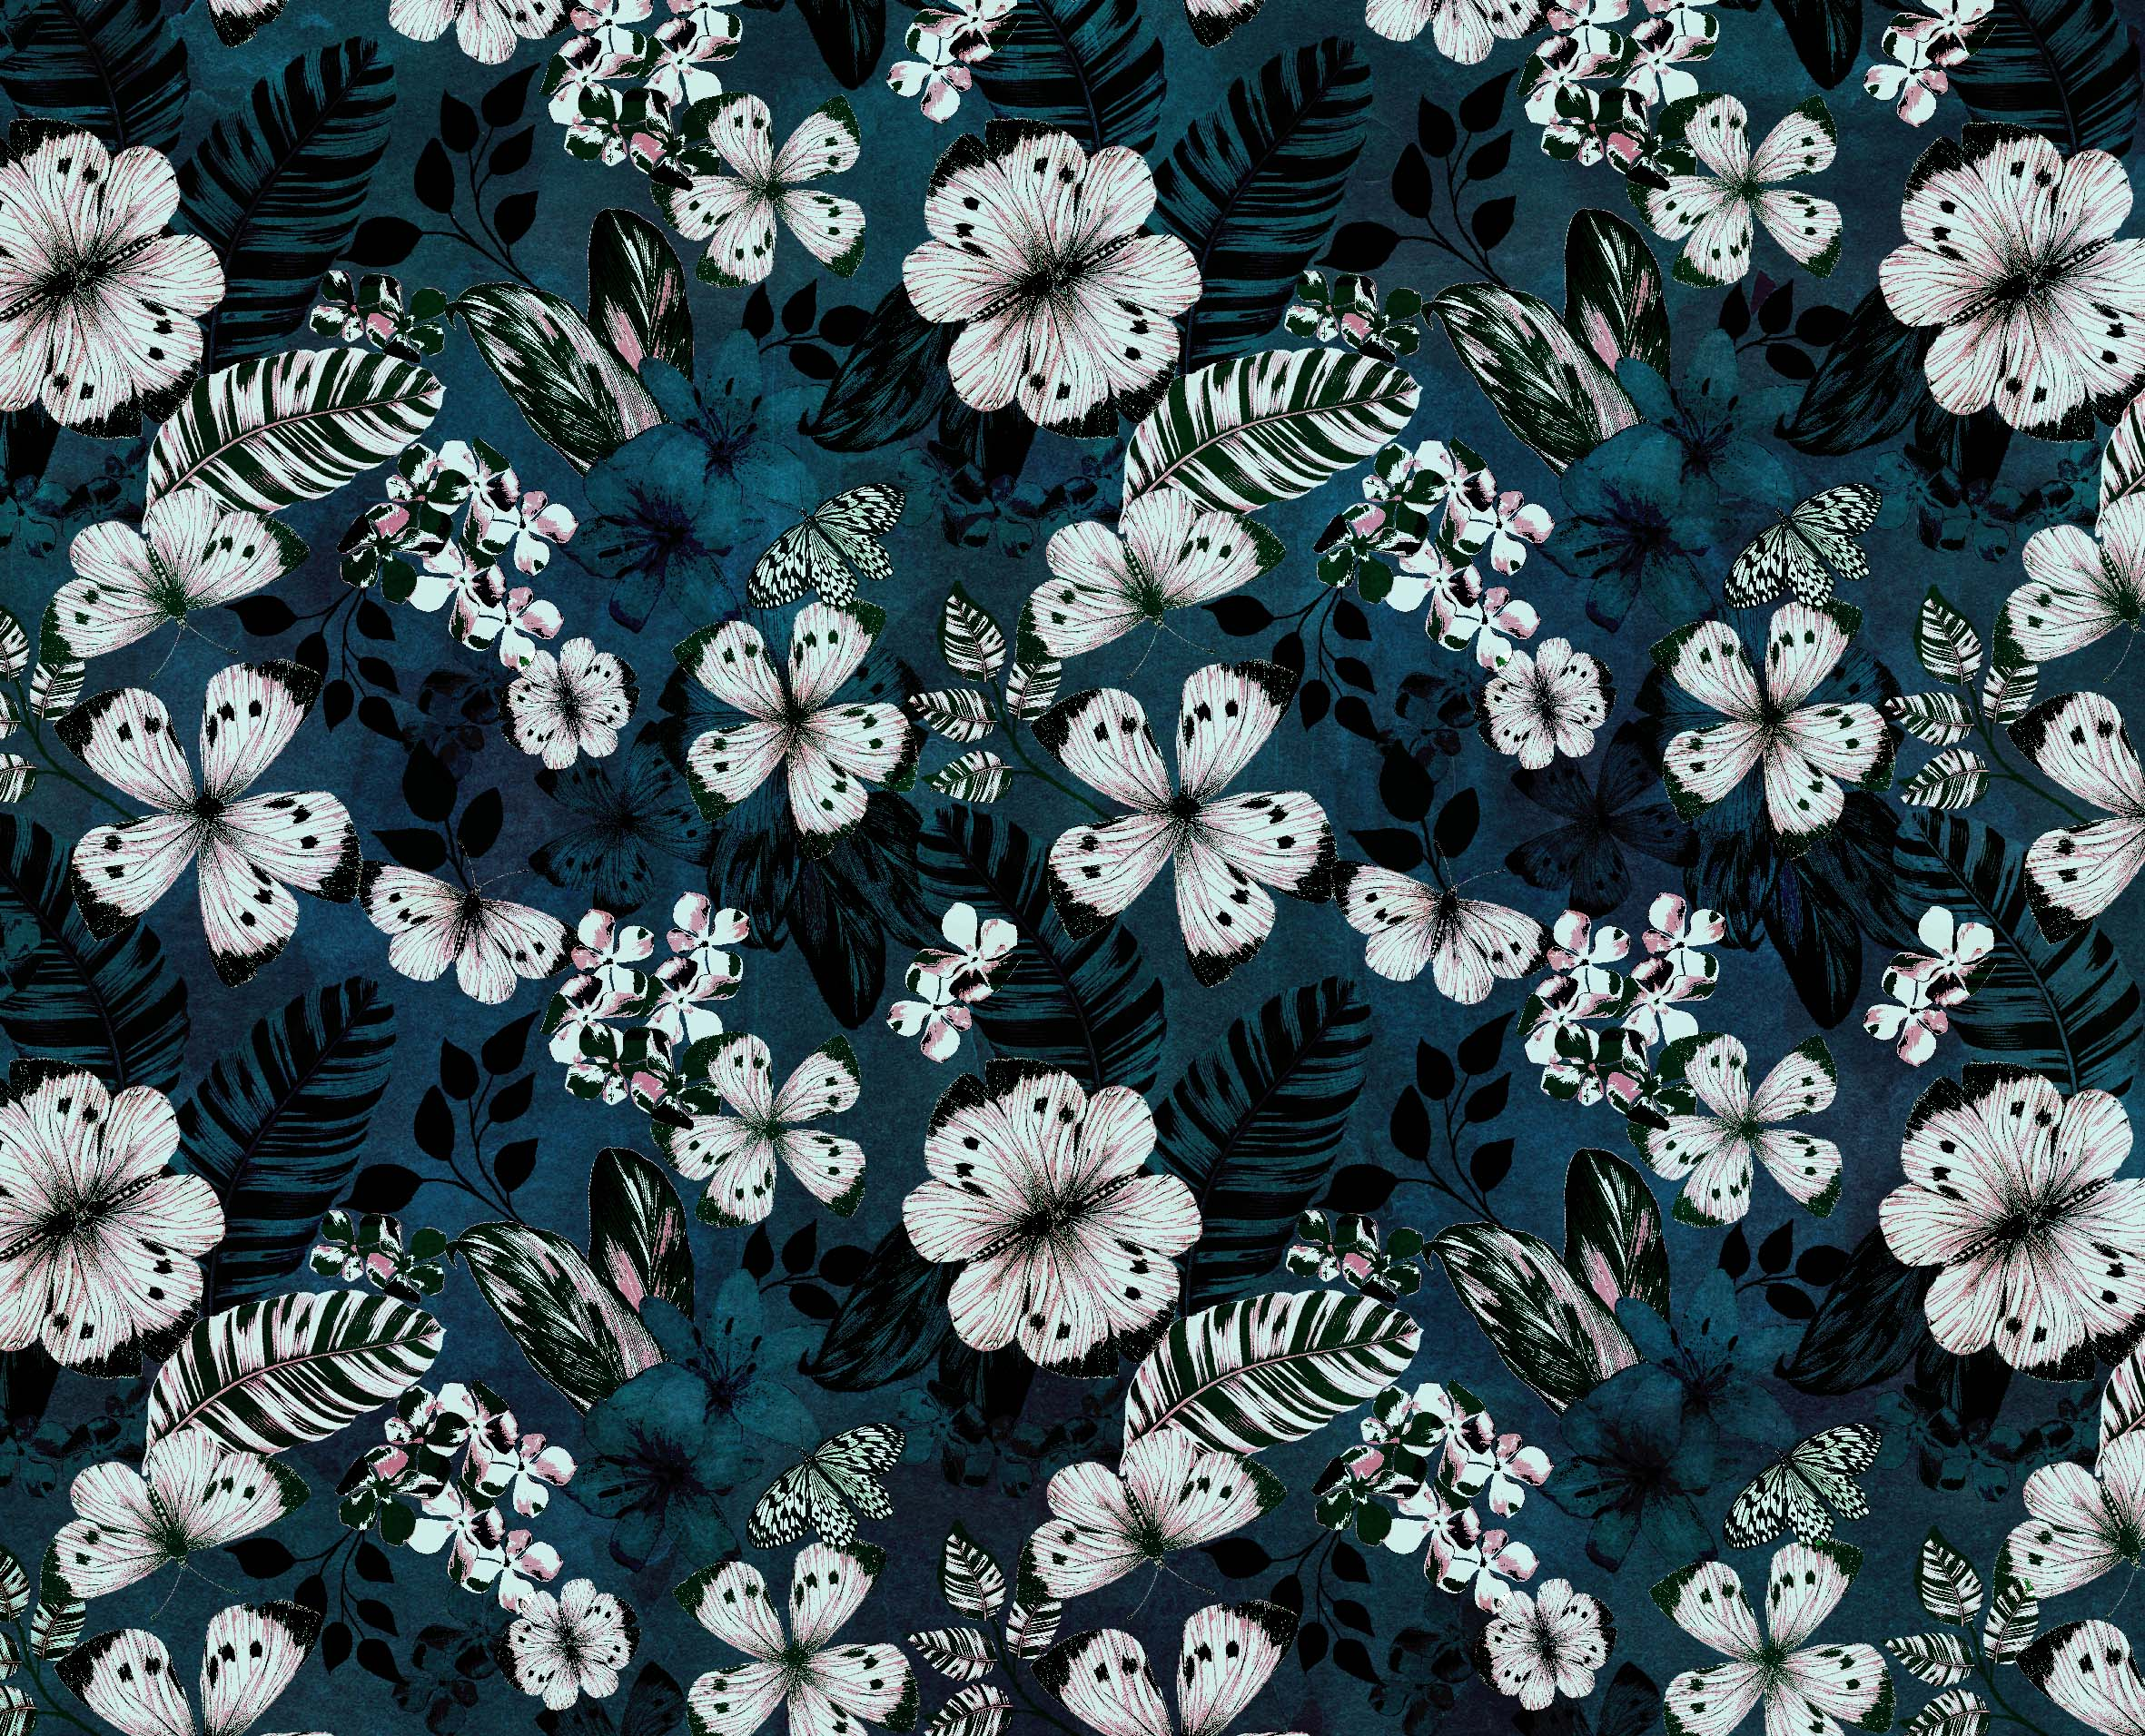 Botanical Print - Stradivarius // Bella Gomez